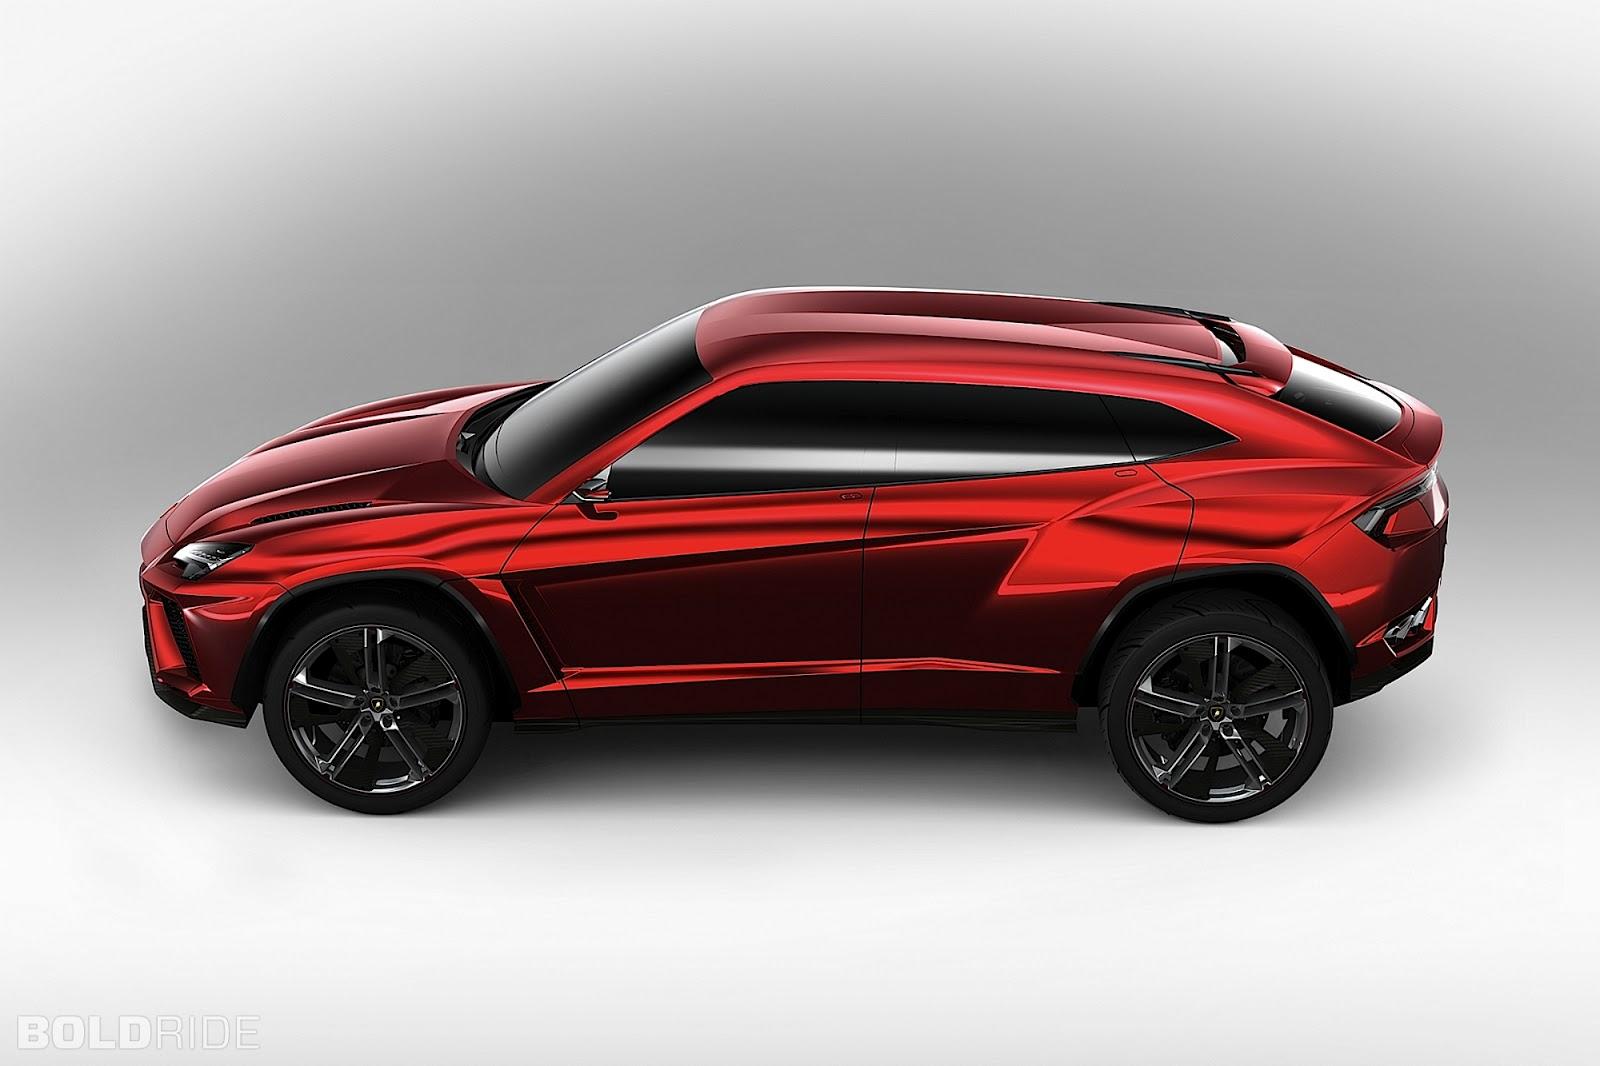 sports cars 2015 lamborghini urus 2015 suv. Black Bedroom Furniture Sets. Home Design Ideas